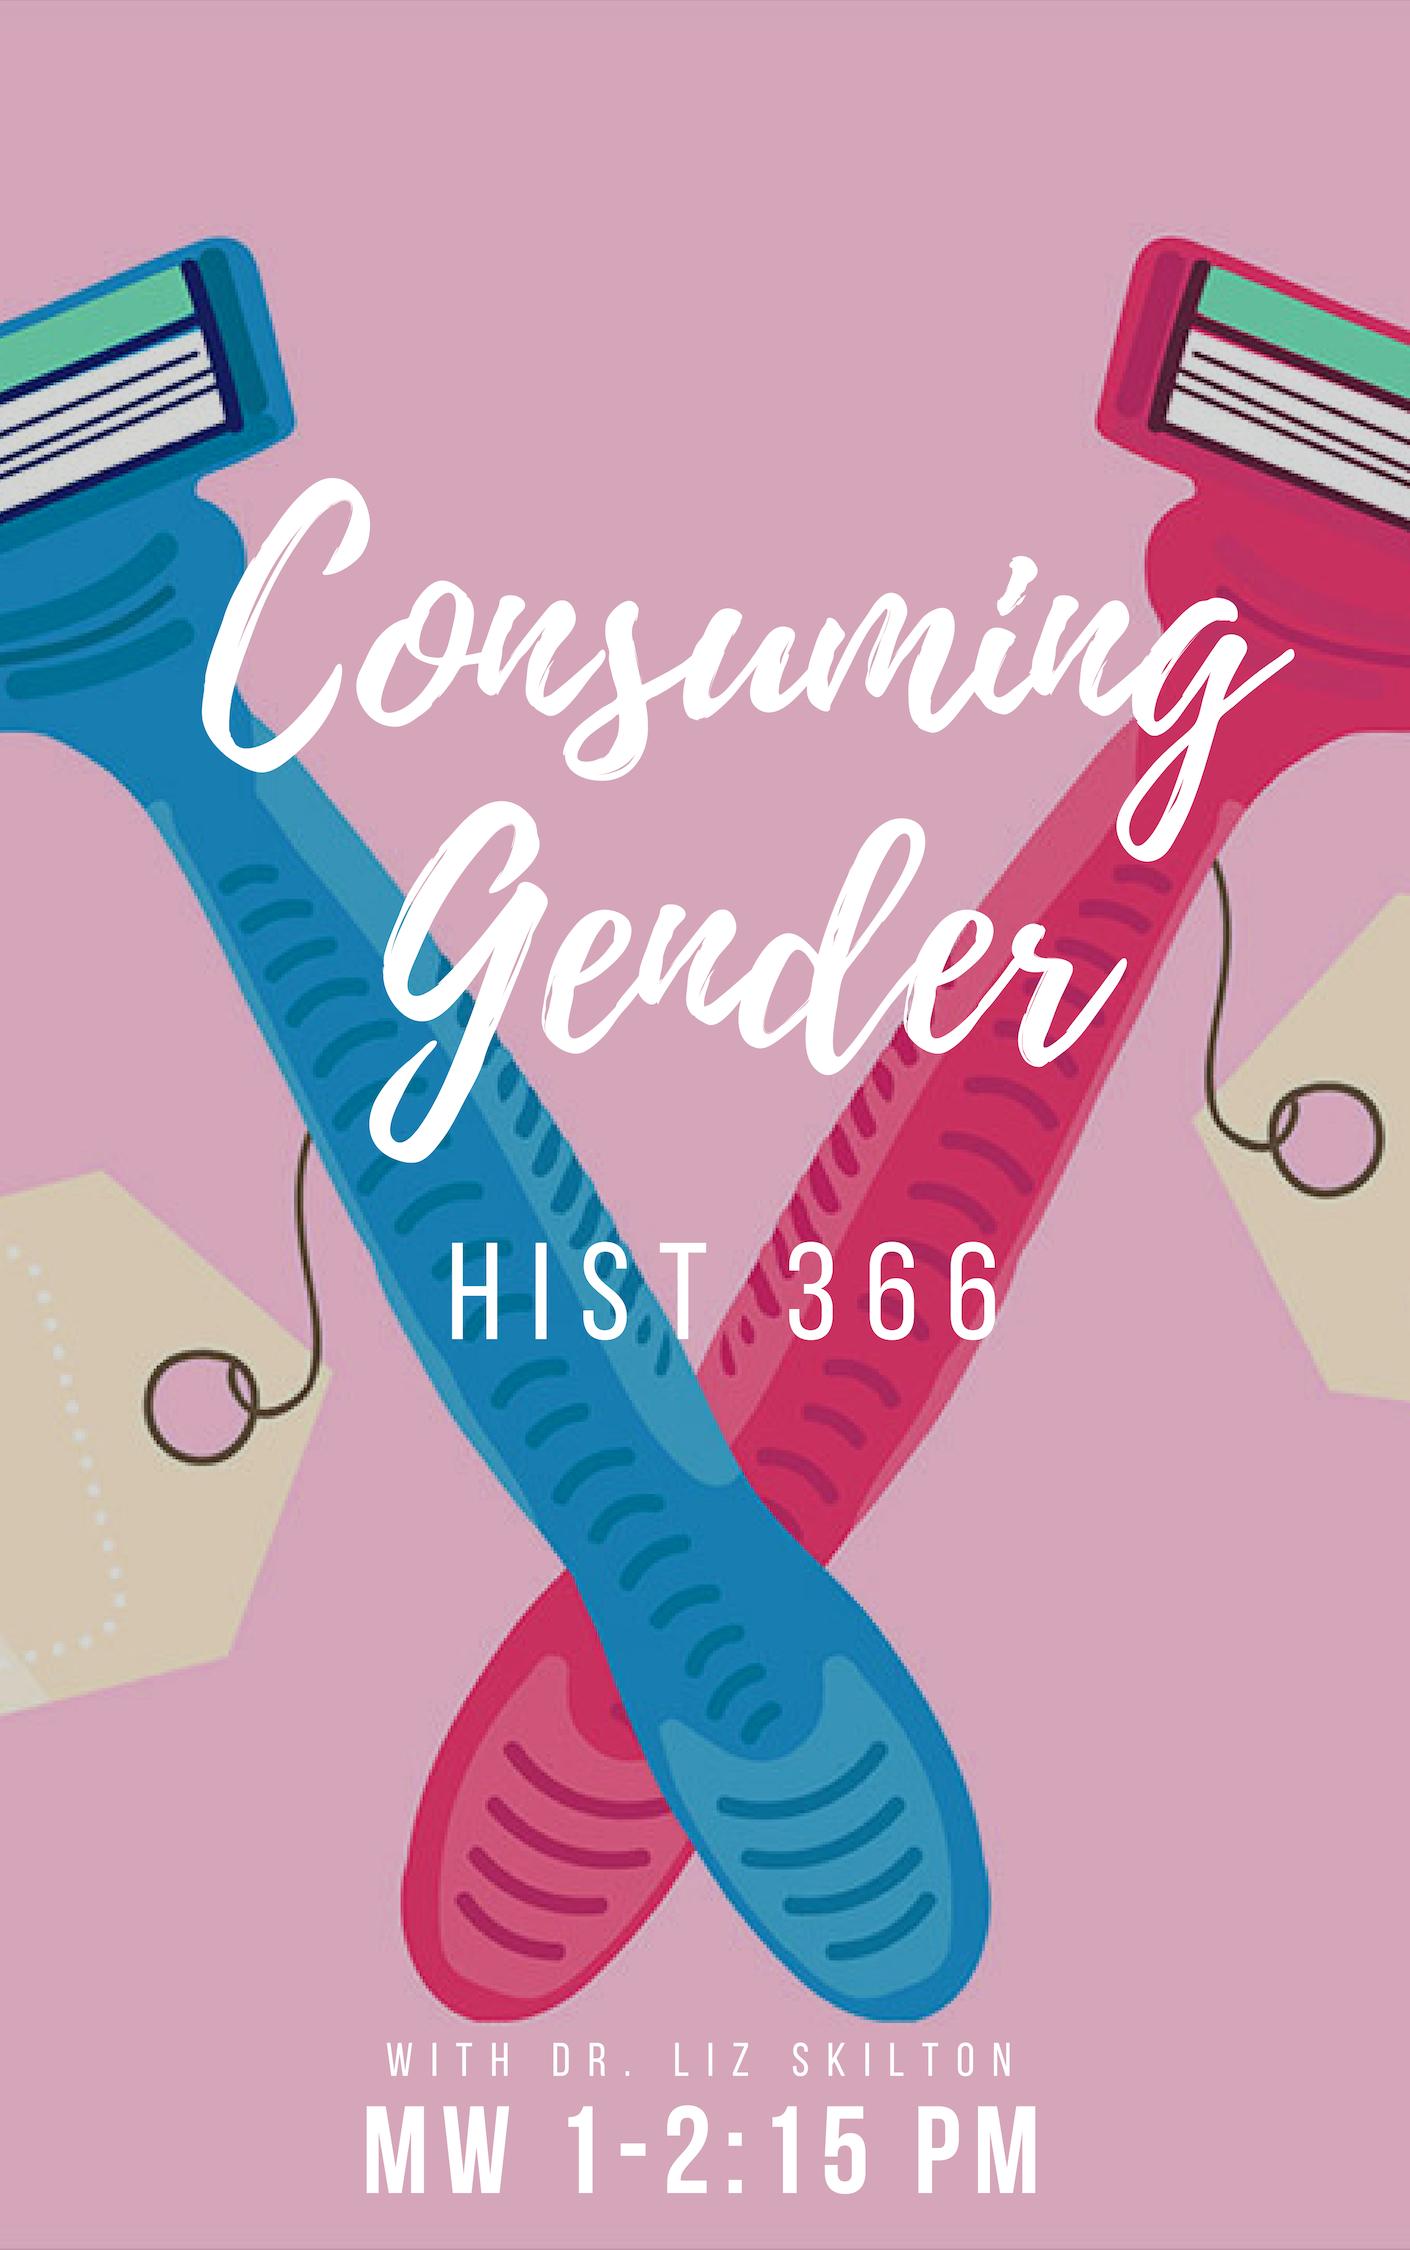 Consuming Gender(1).jpg